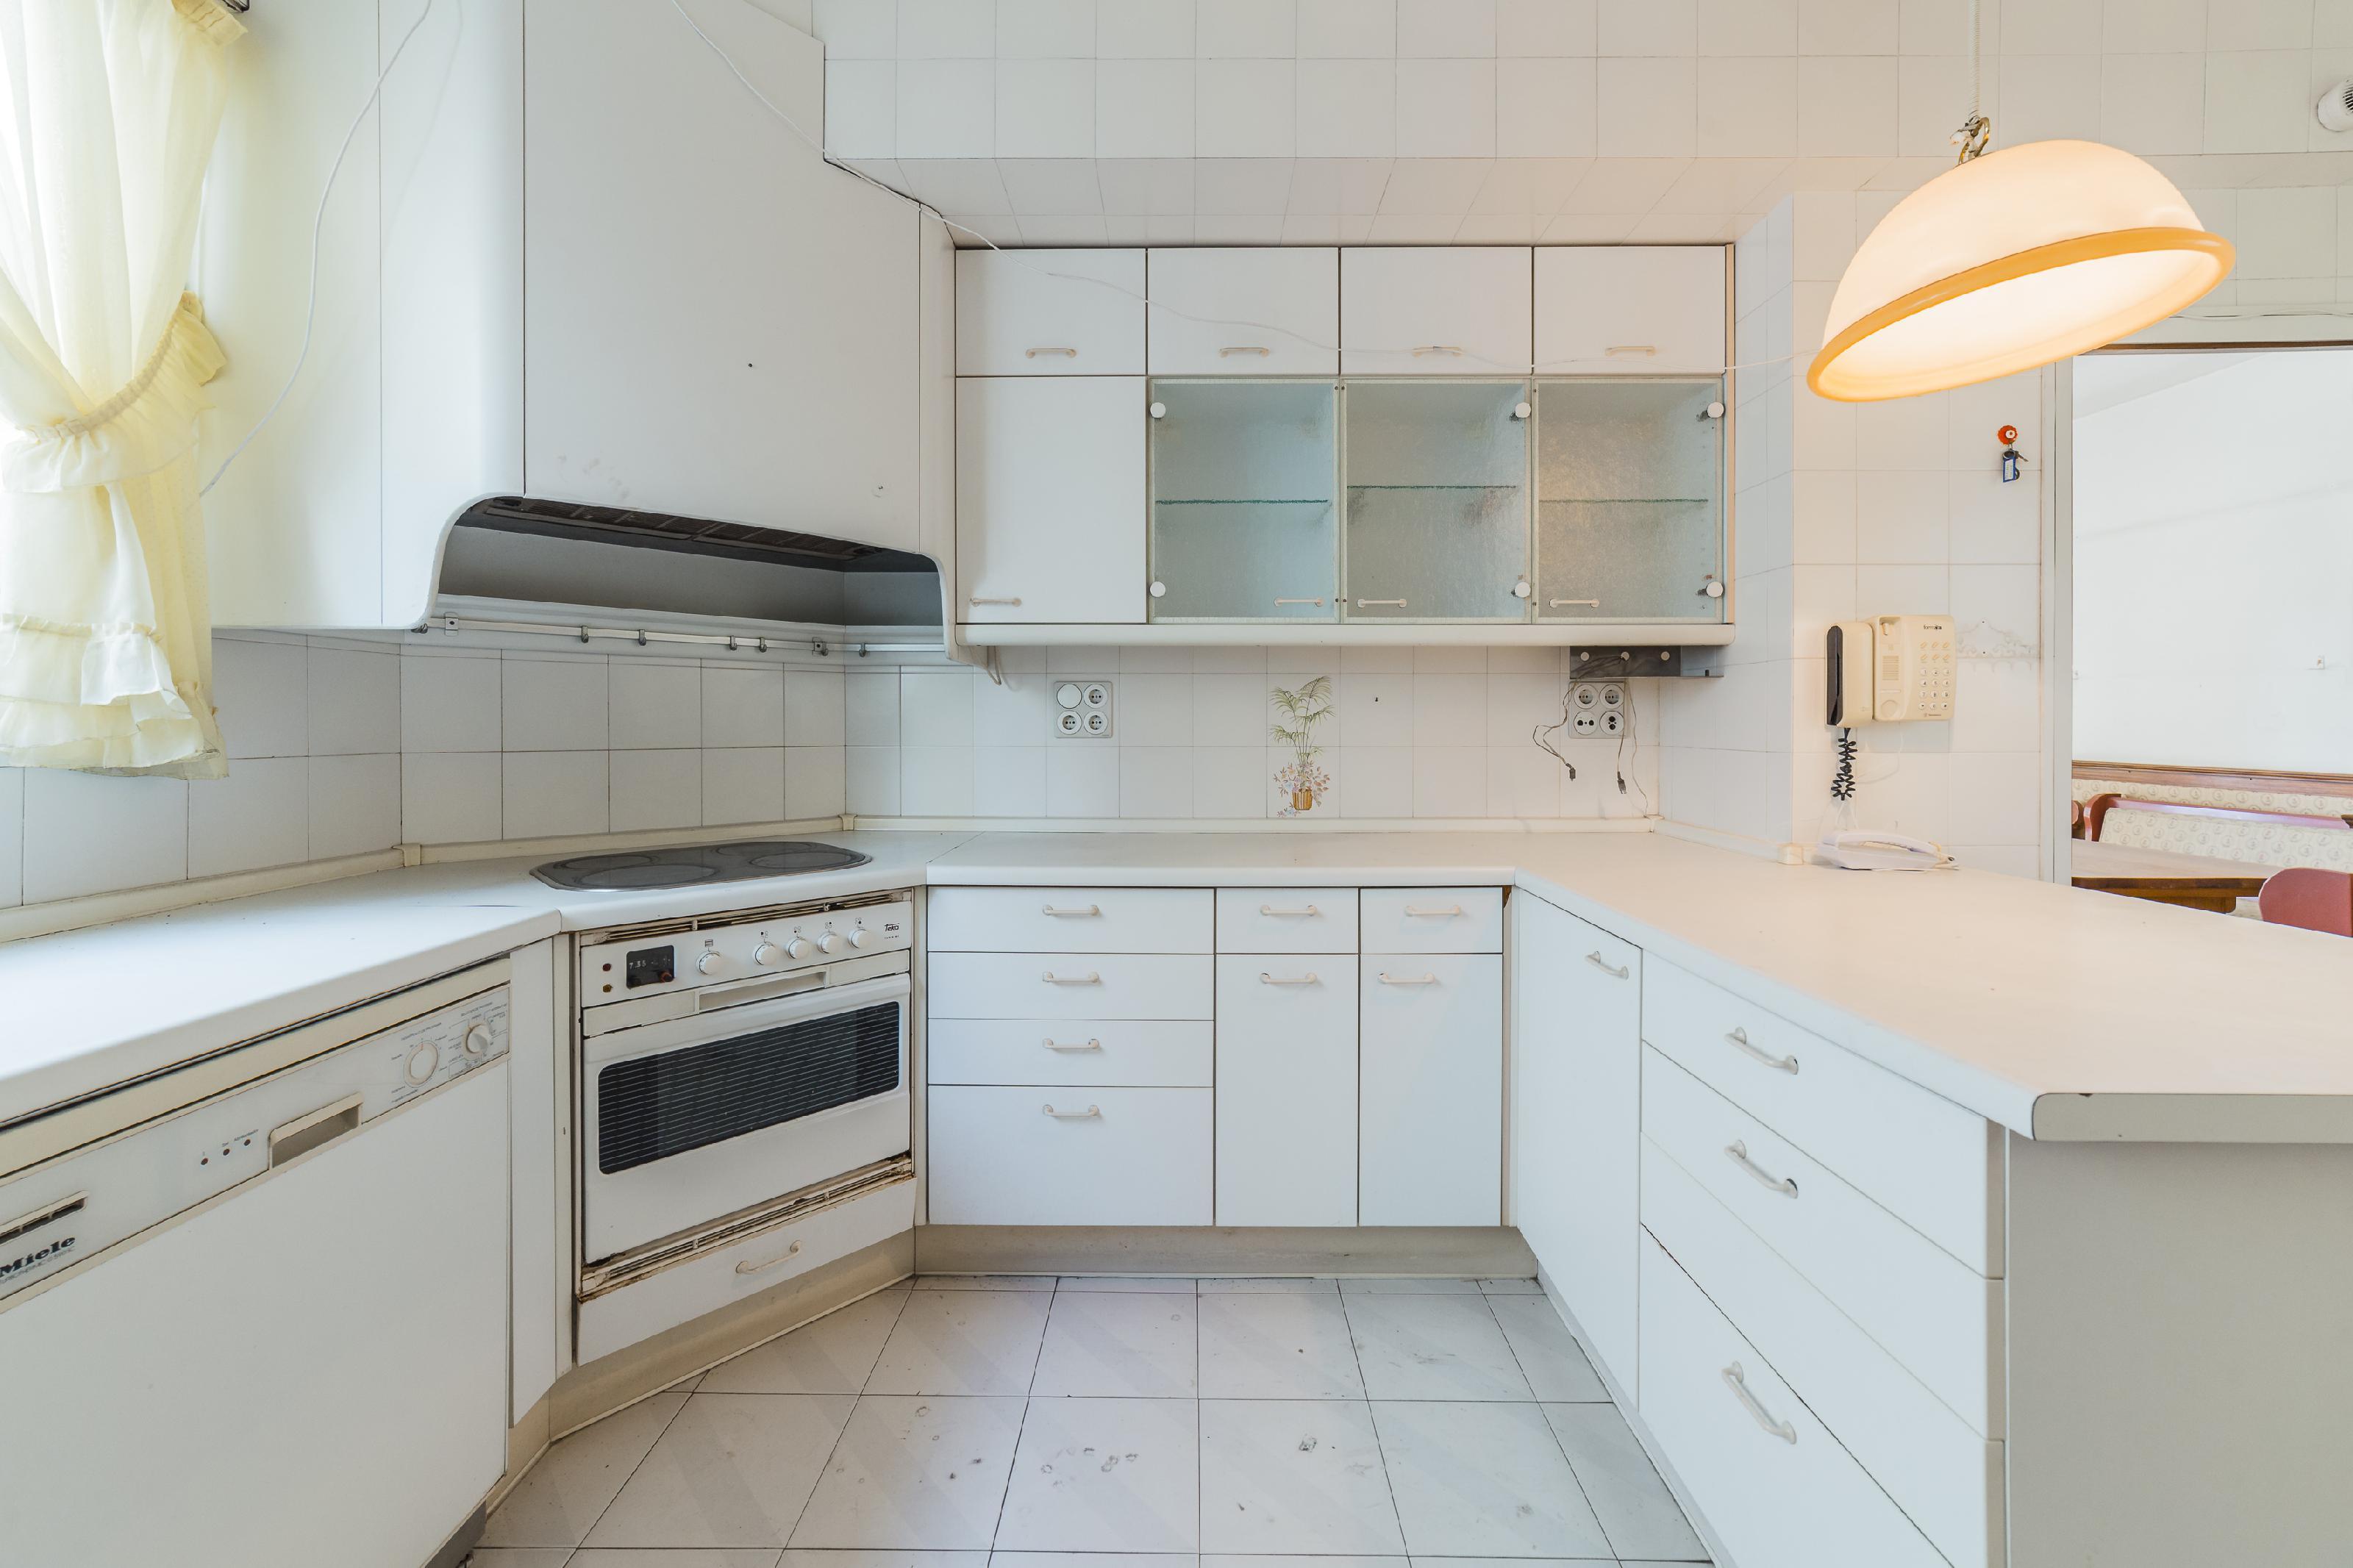 249314 Penthouse for sale in Sarrià-Sant Gervasi, Sant Gervasi-Galvany 15